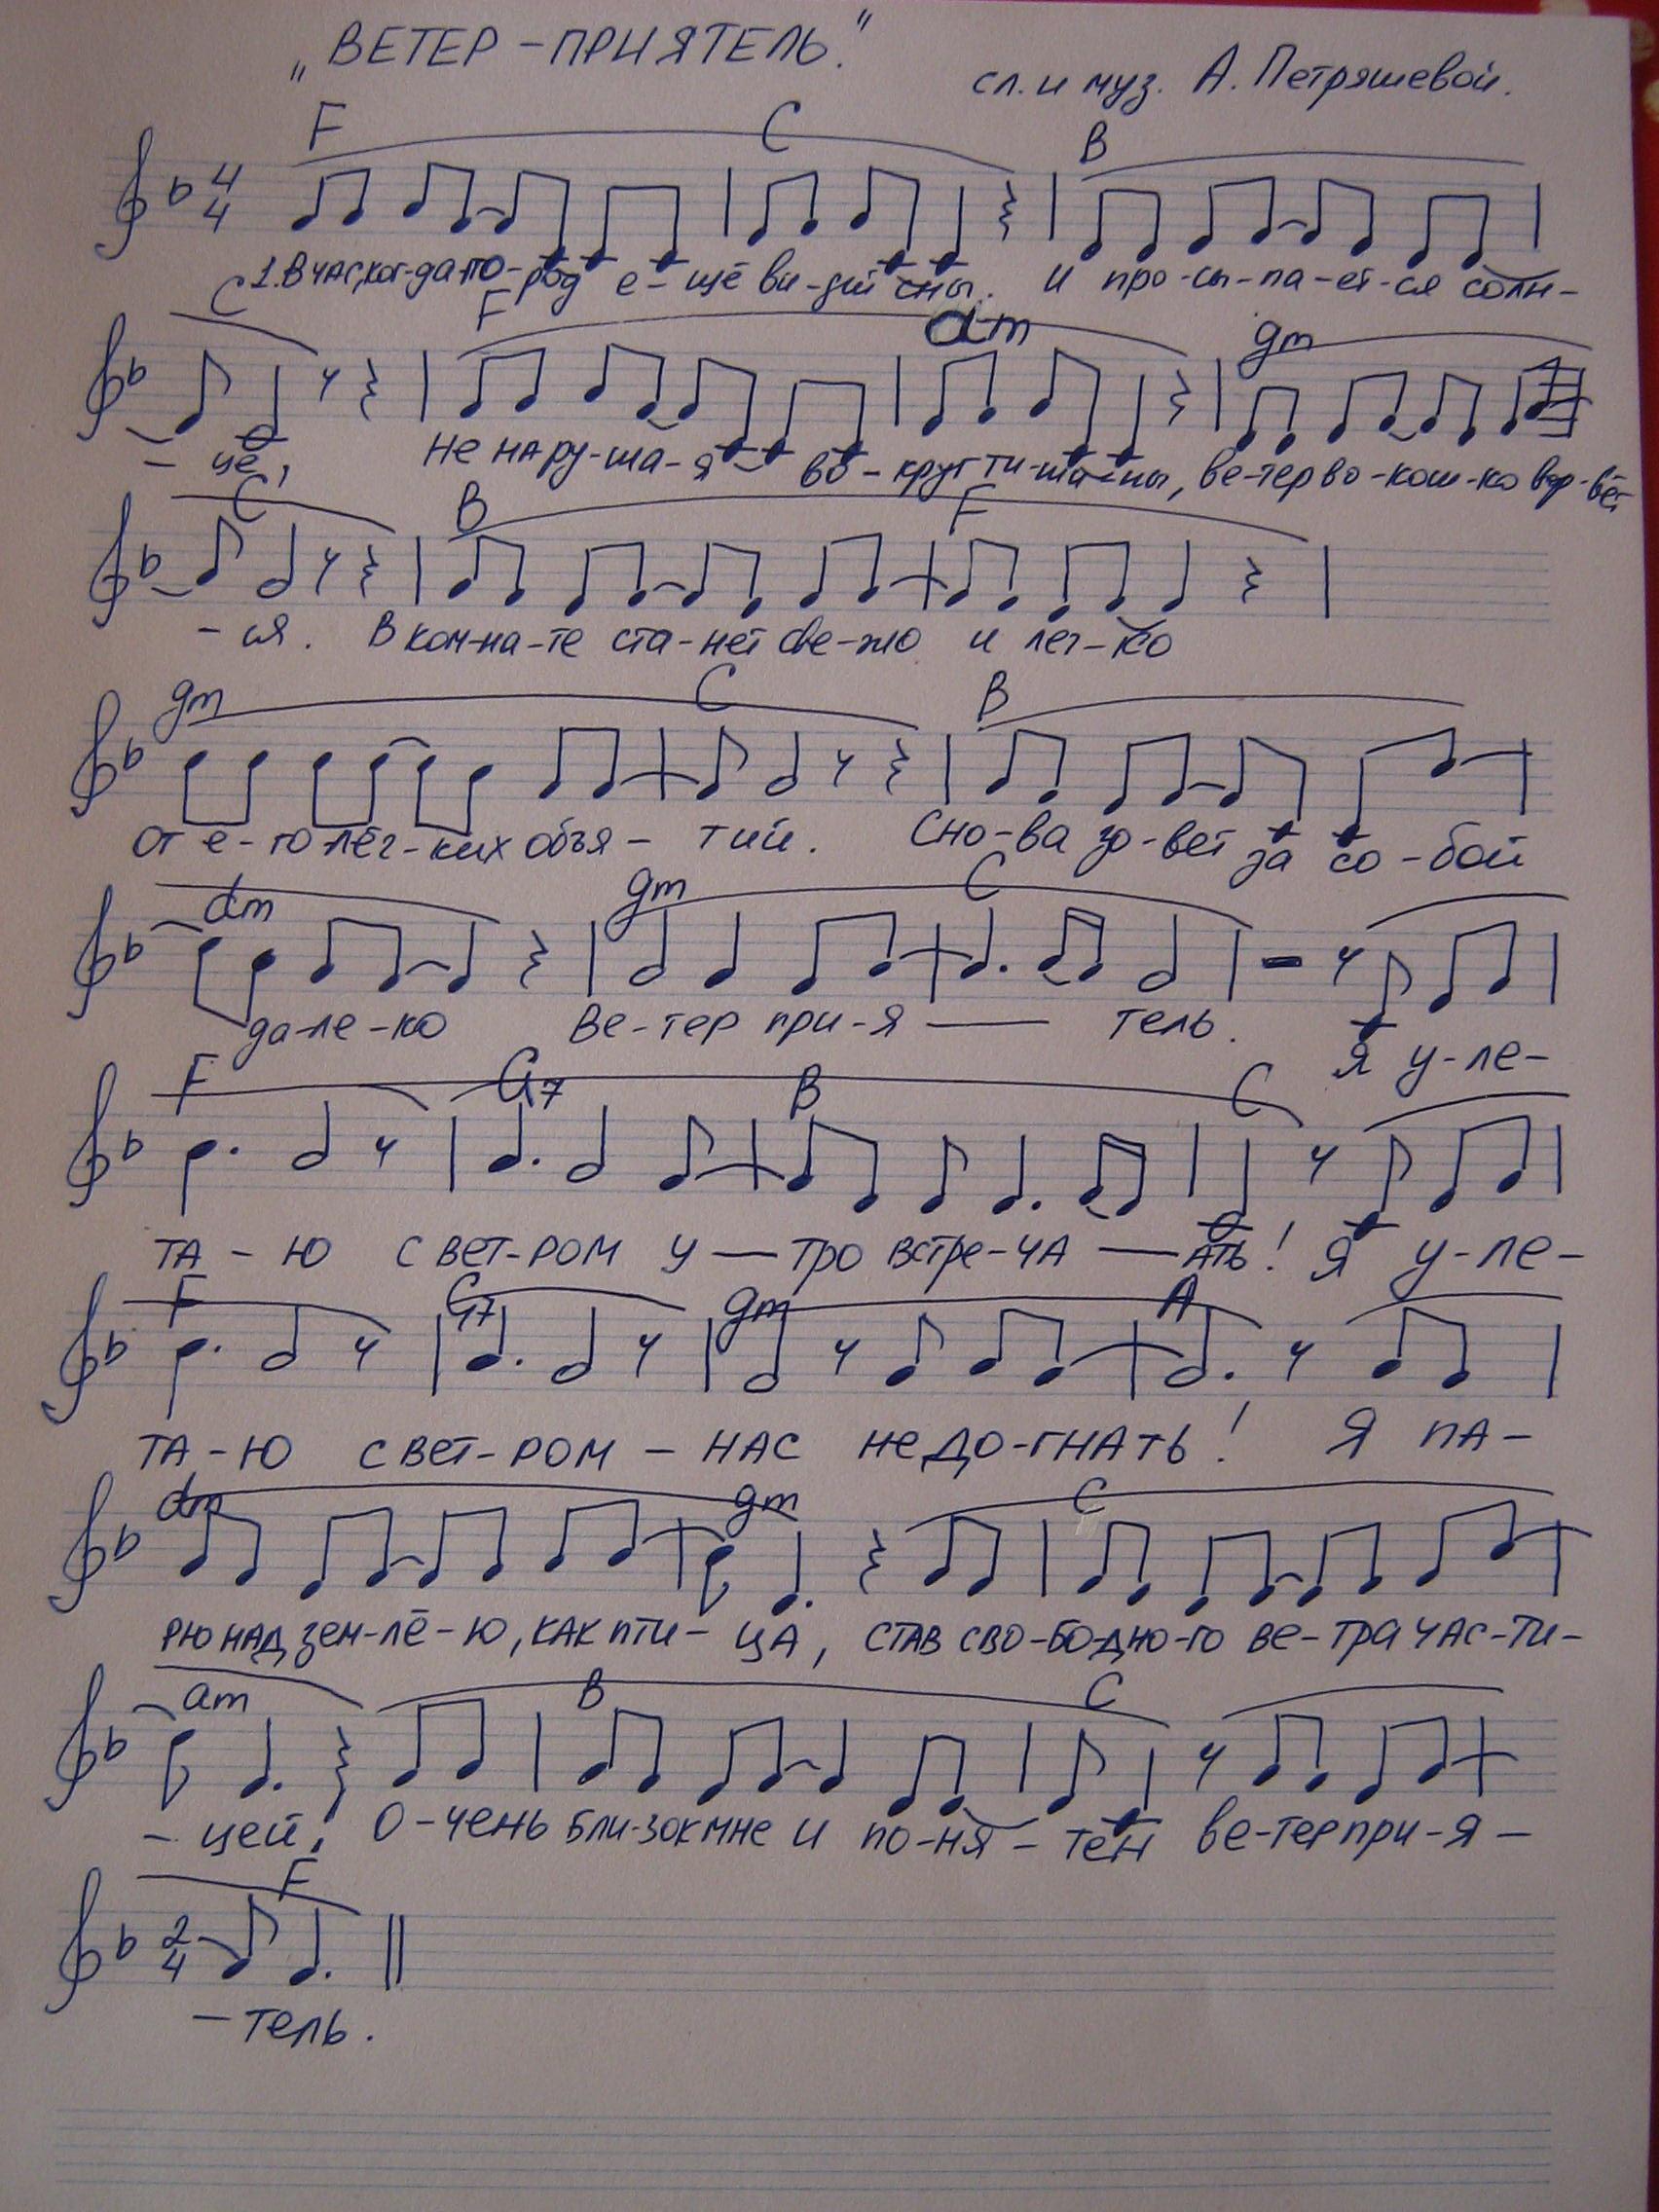 Анна петряшева караоке я устала петь по нотам